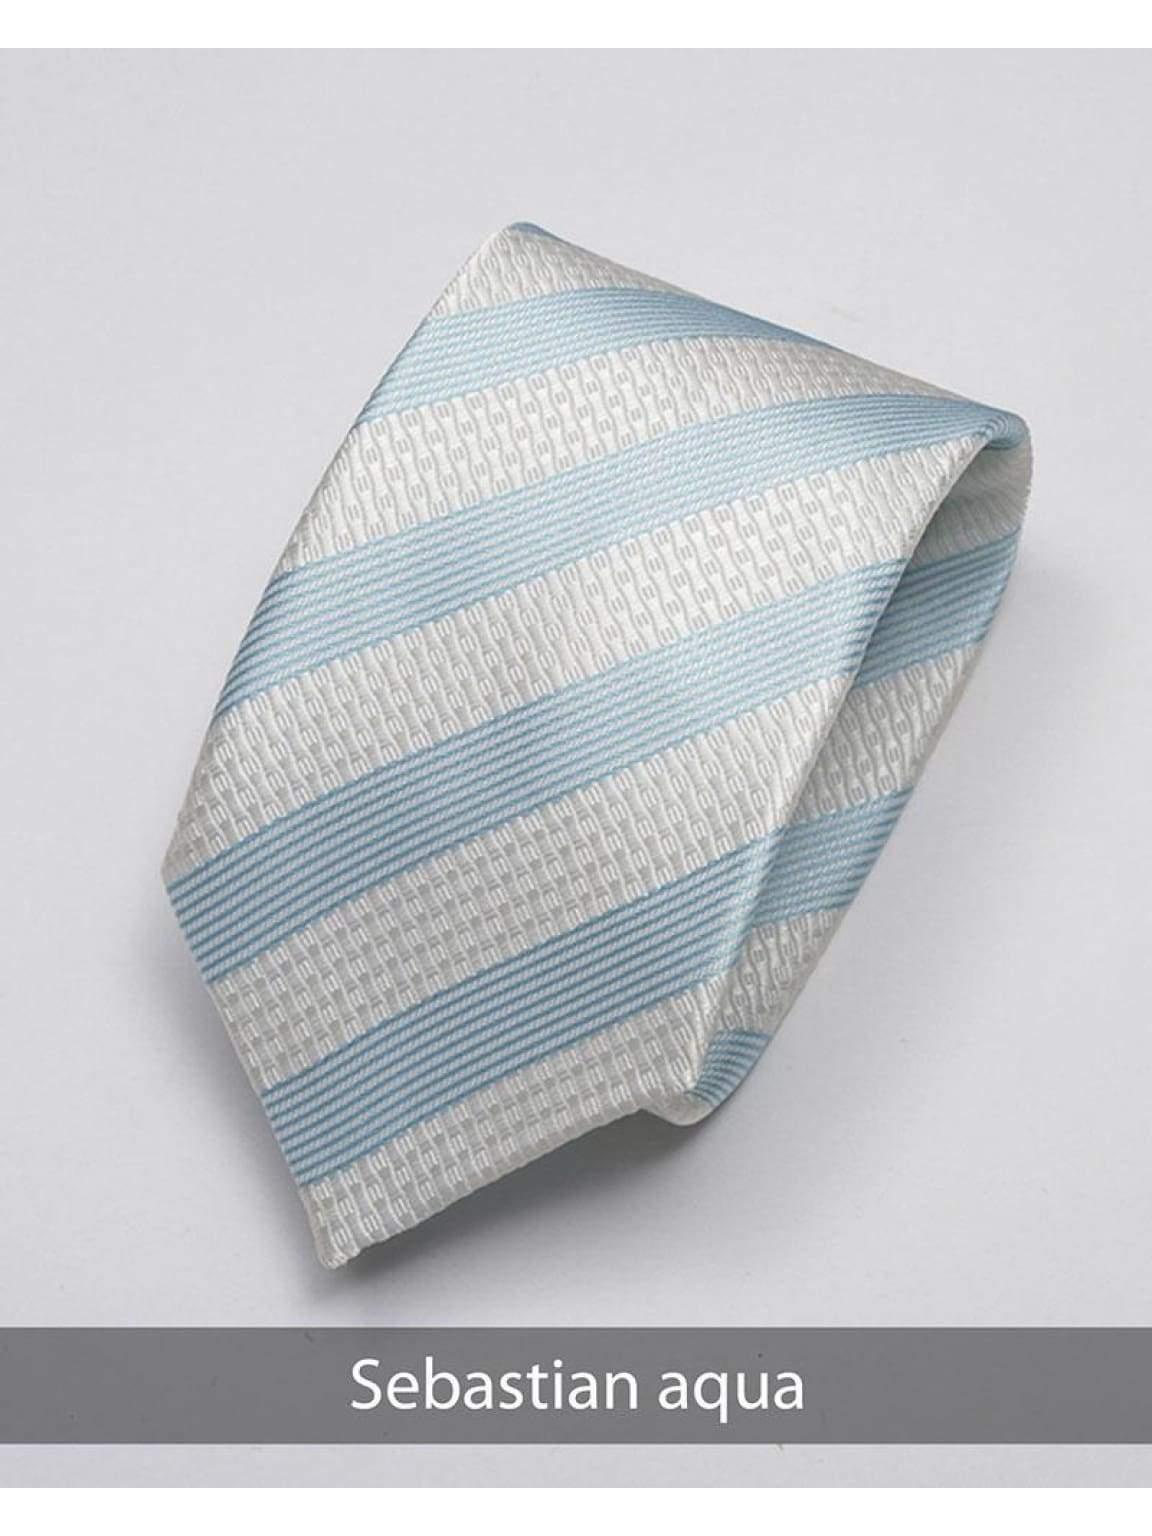 Heirloom Sebastian Mens Aqua Stripped Tie - Accessories